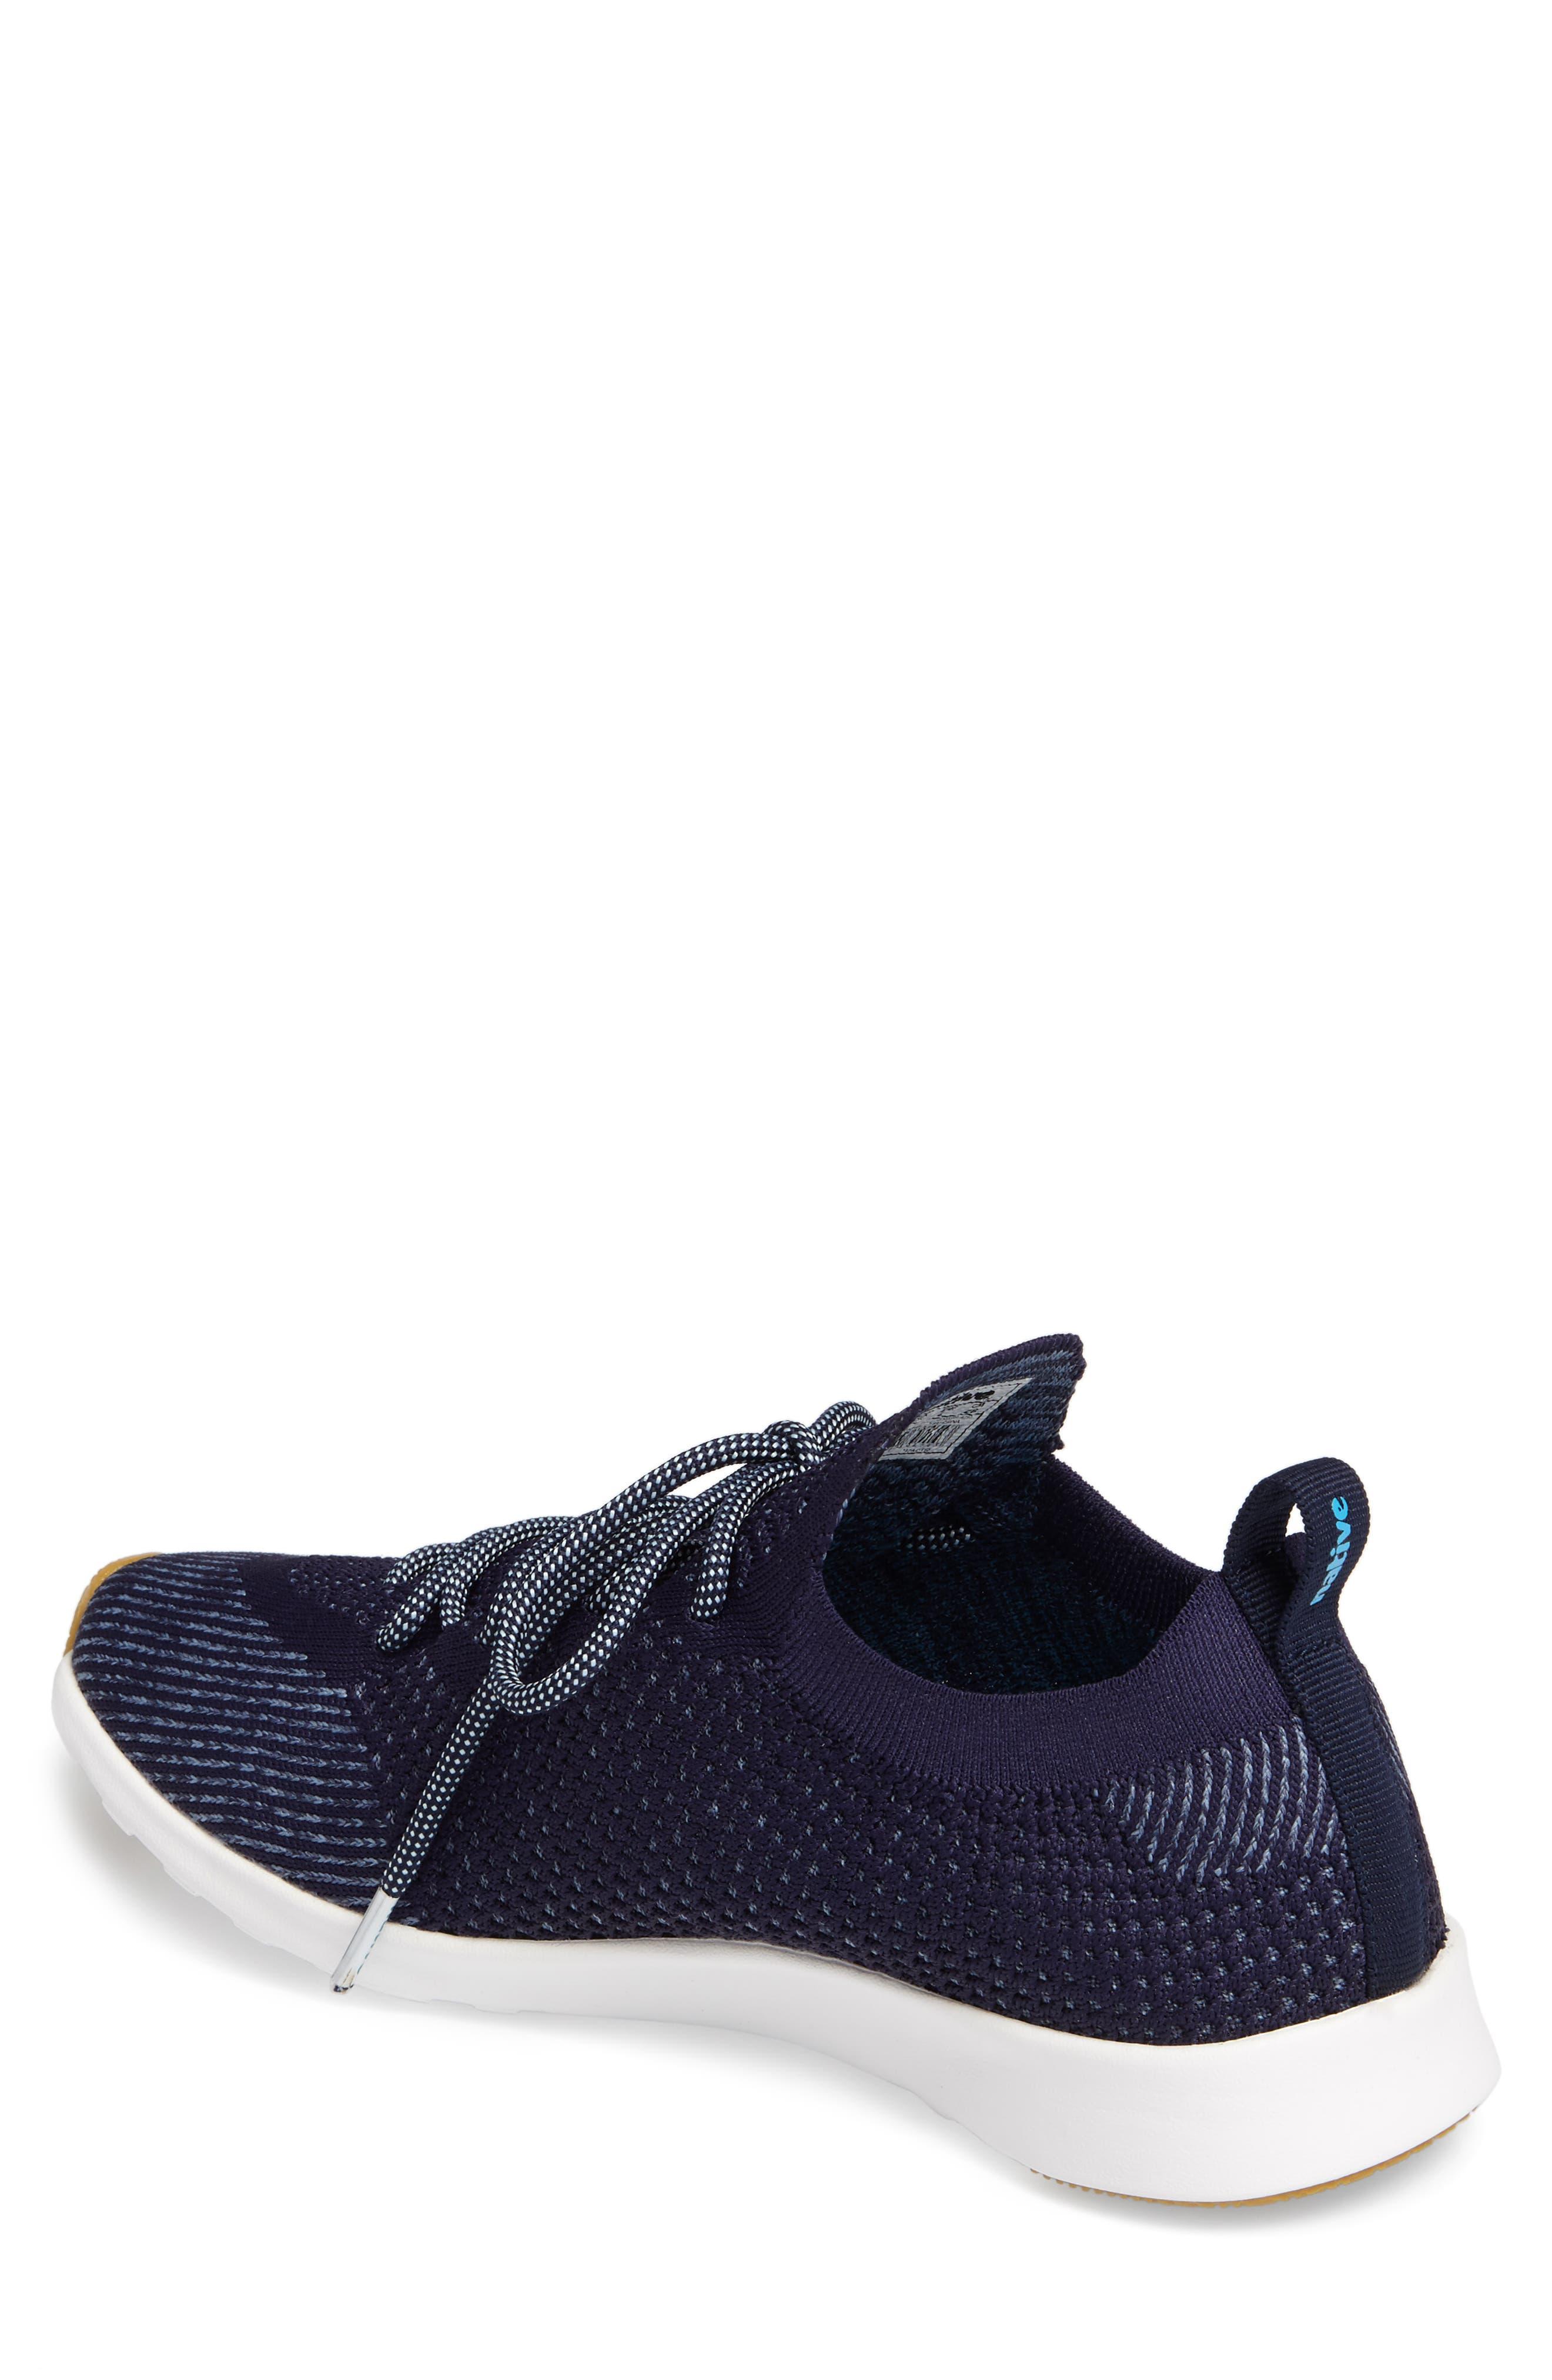 Alternate Image 2  - Native Shoes AP Mercury Liteknit™ Sneaker